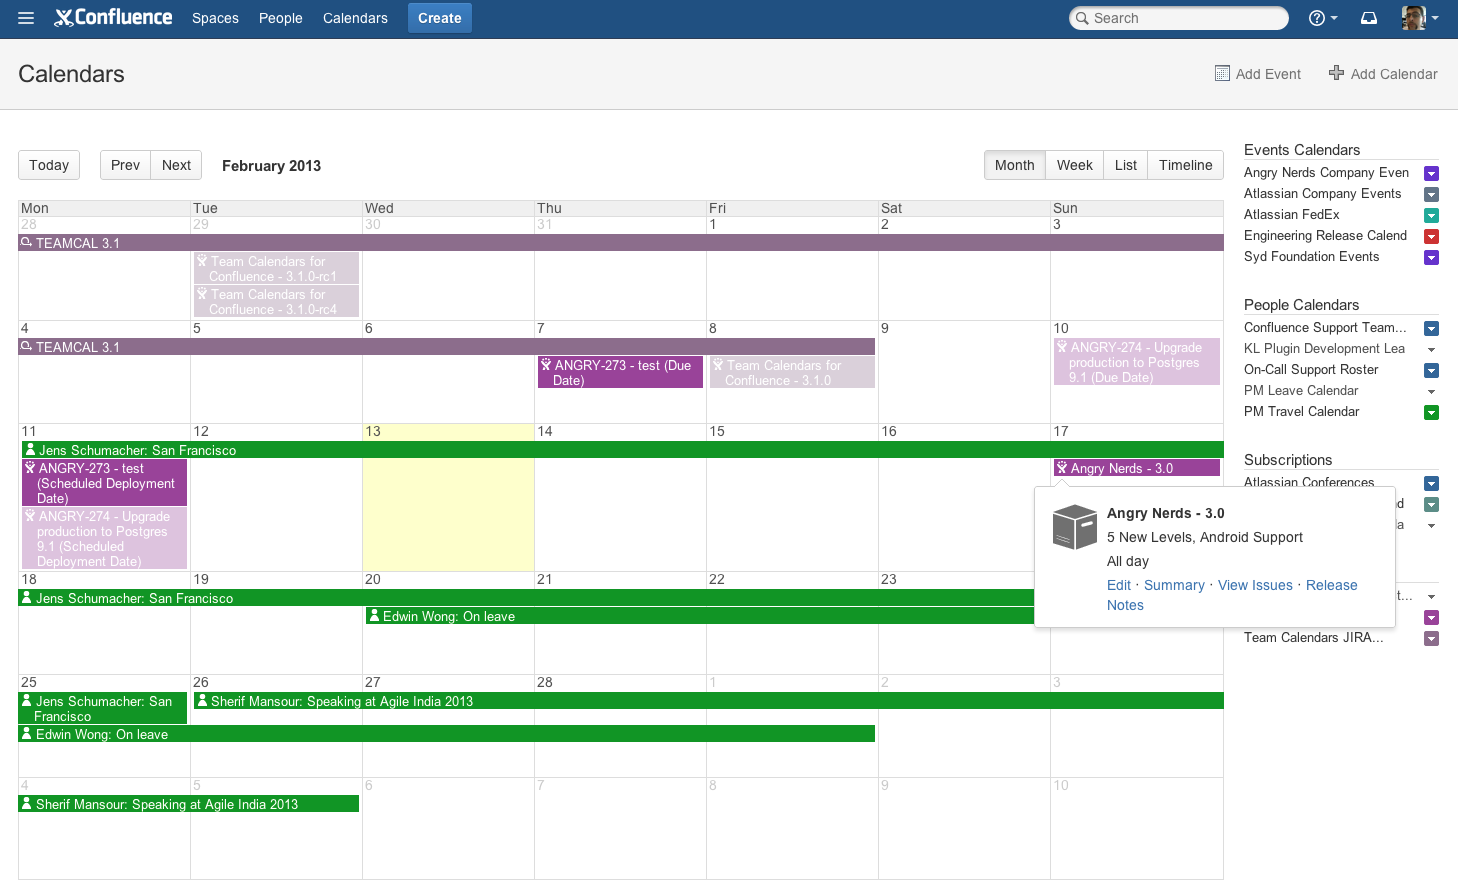 Team Calendars 3.1 Release Notes - Team Calendars 3.2 and earlier ...